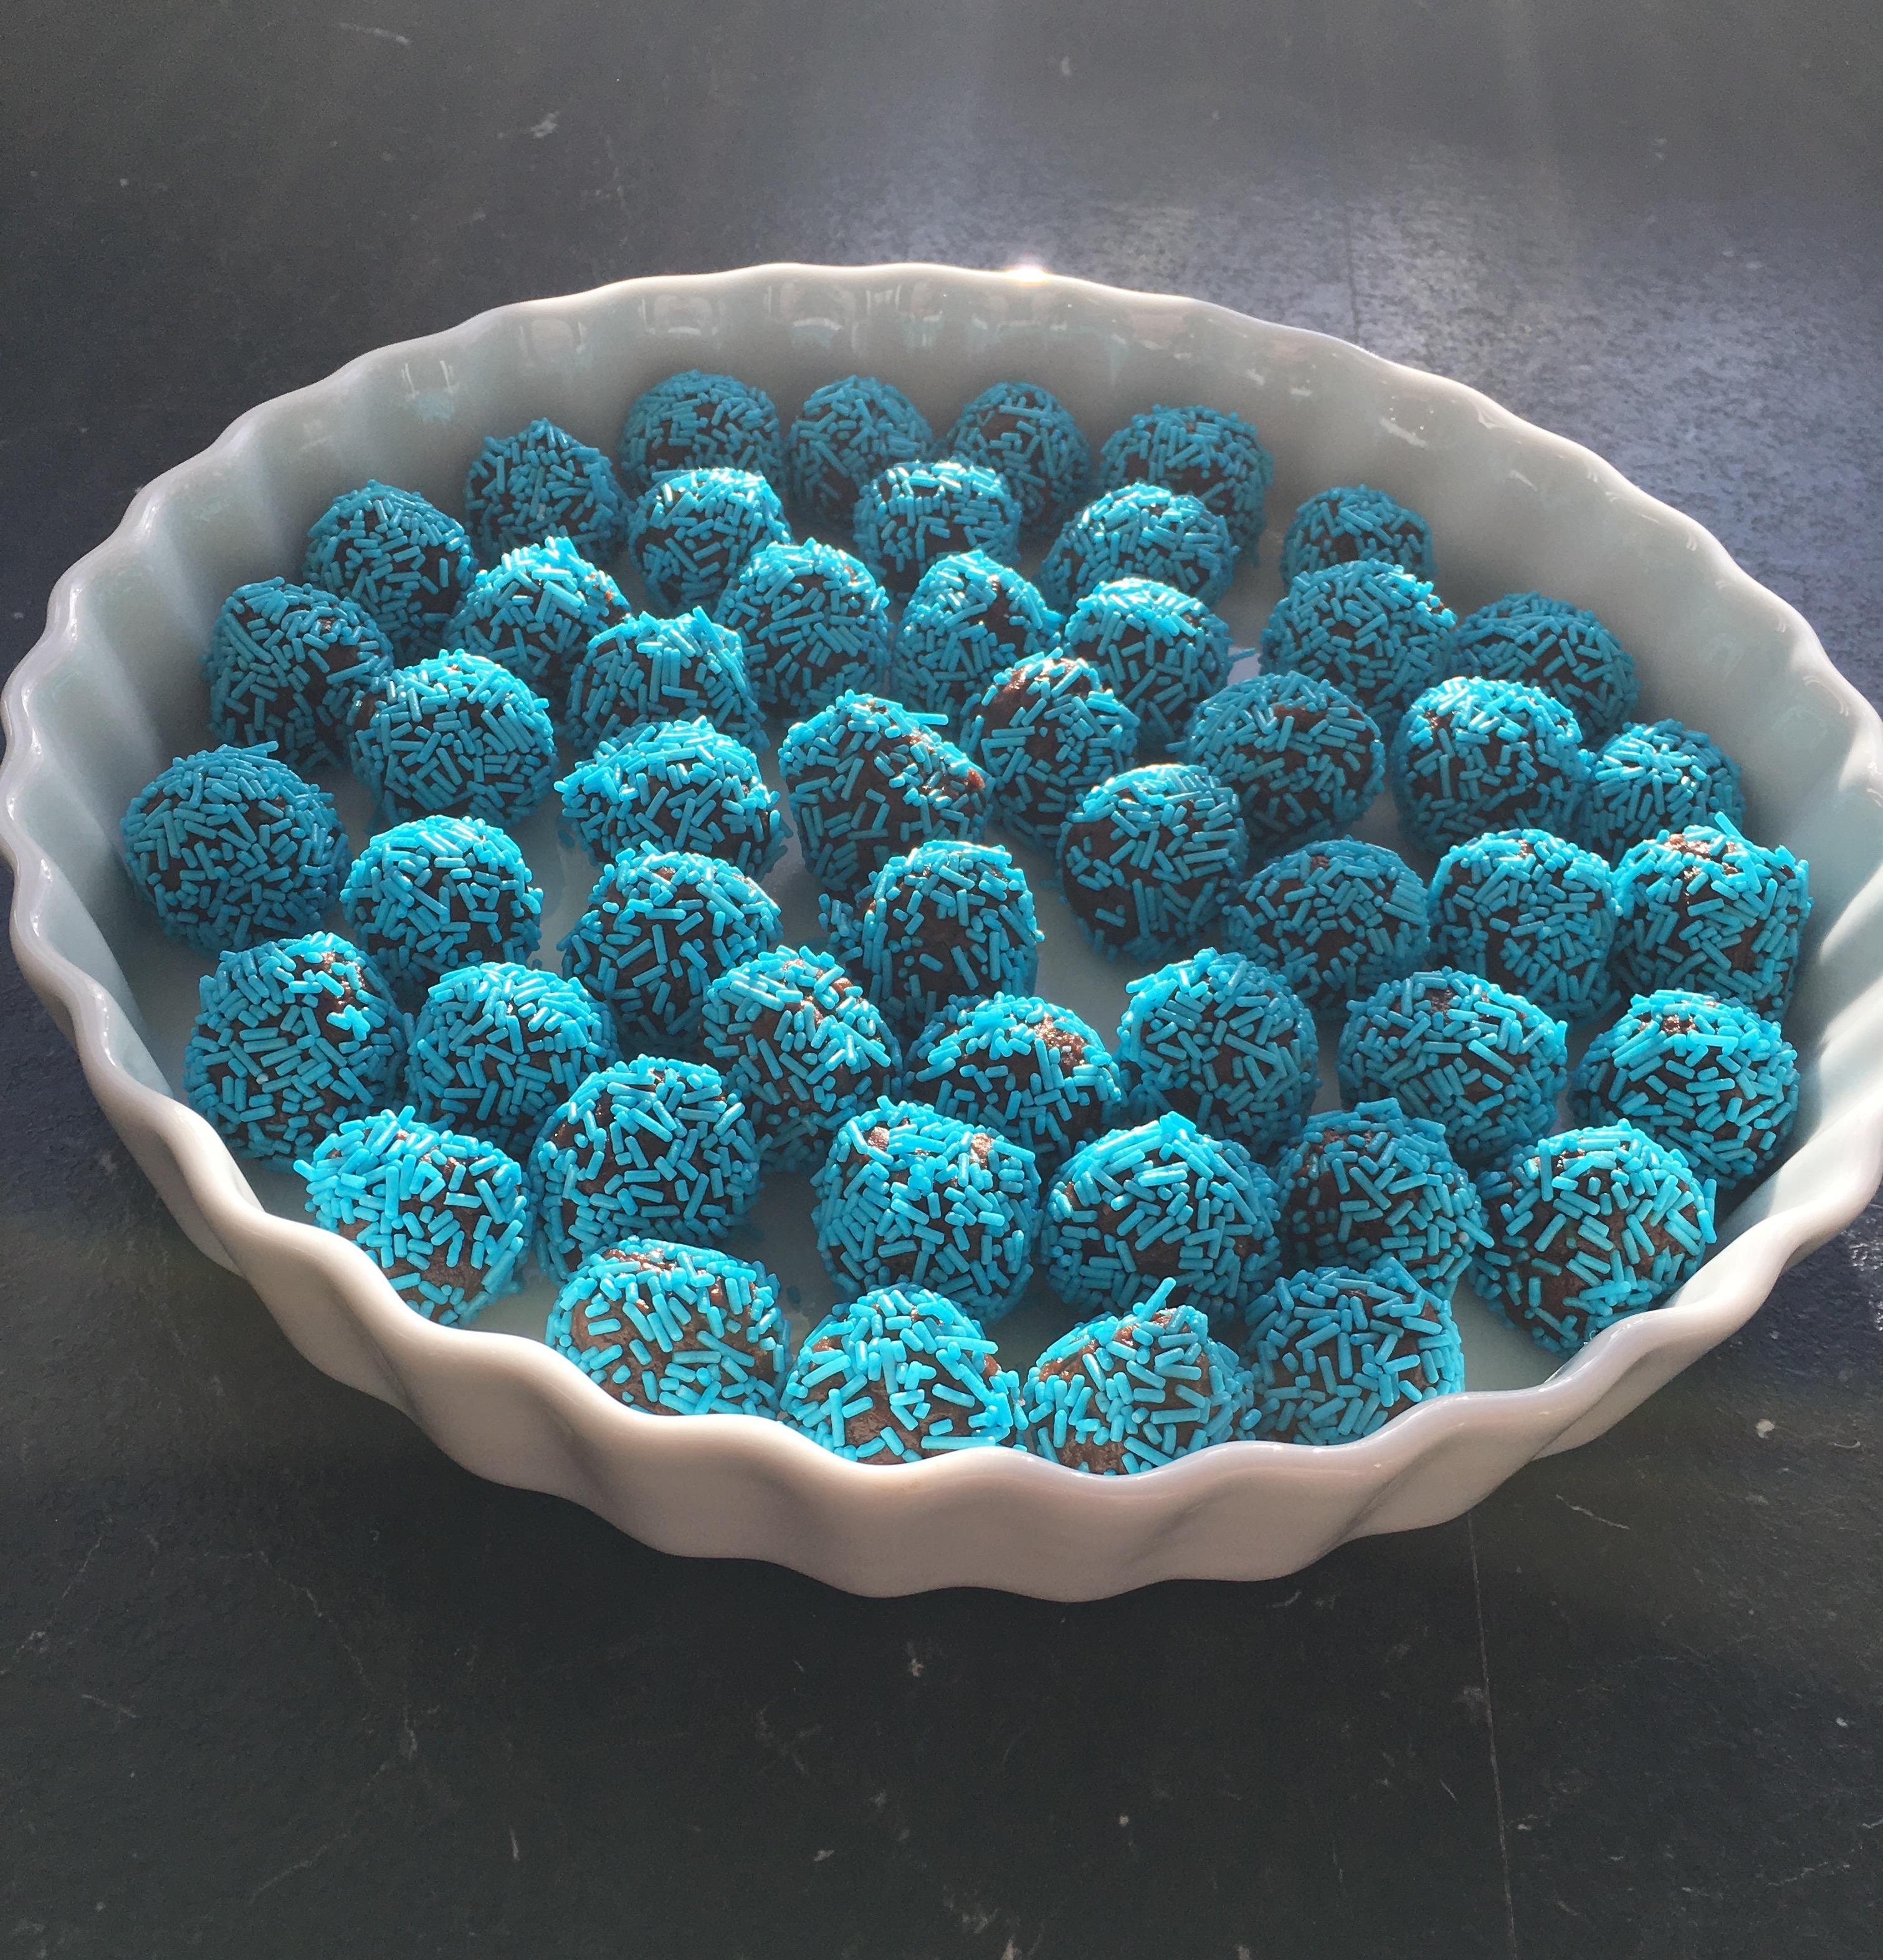 Jeg lagde en opskrift på de blå trøfler fra barnedåben på bloggen.